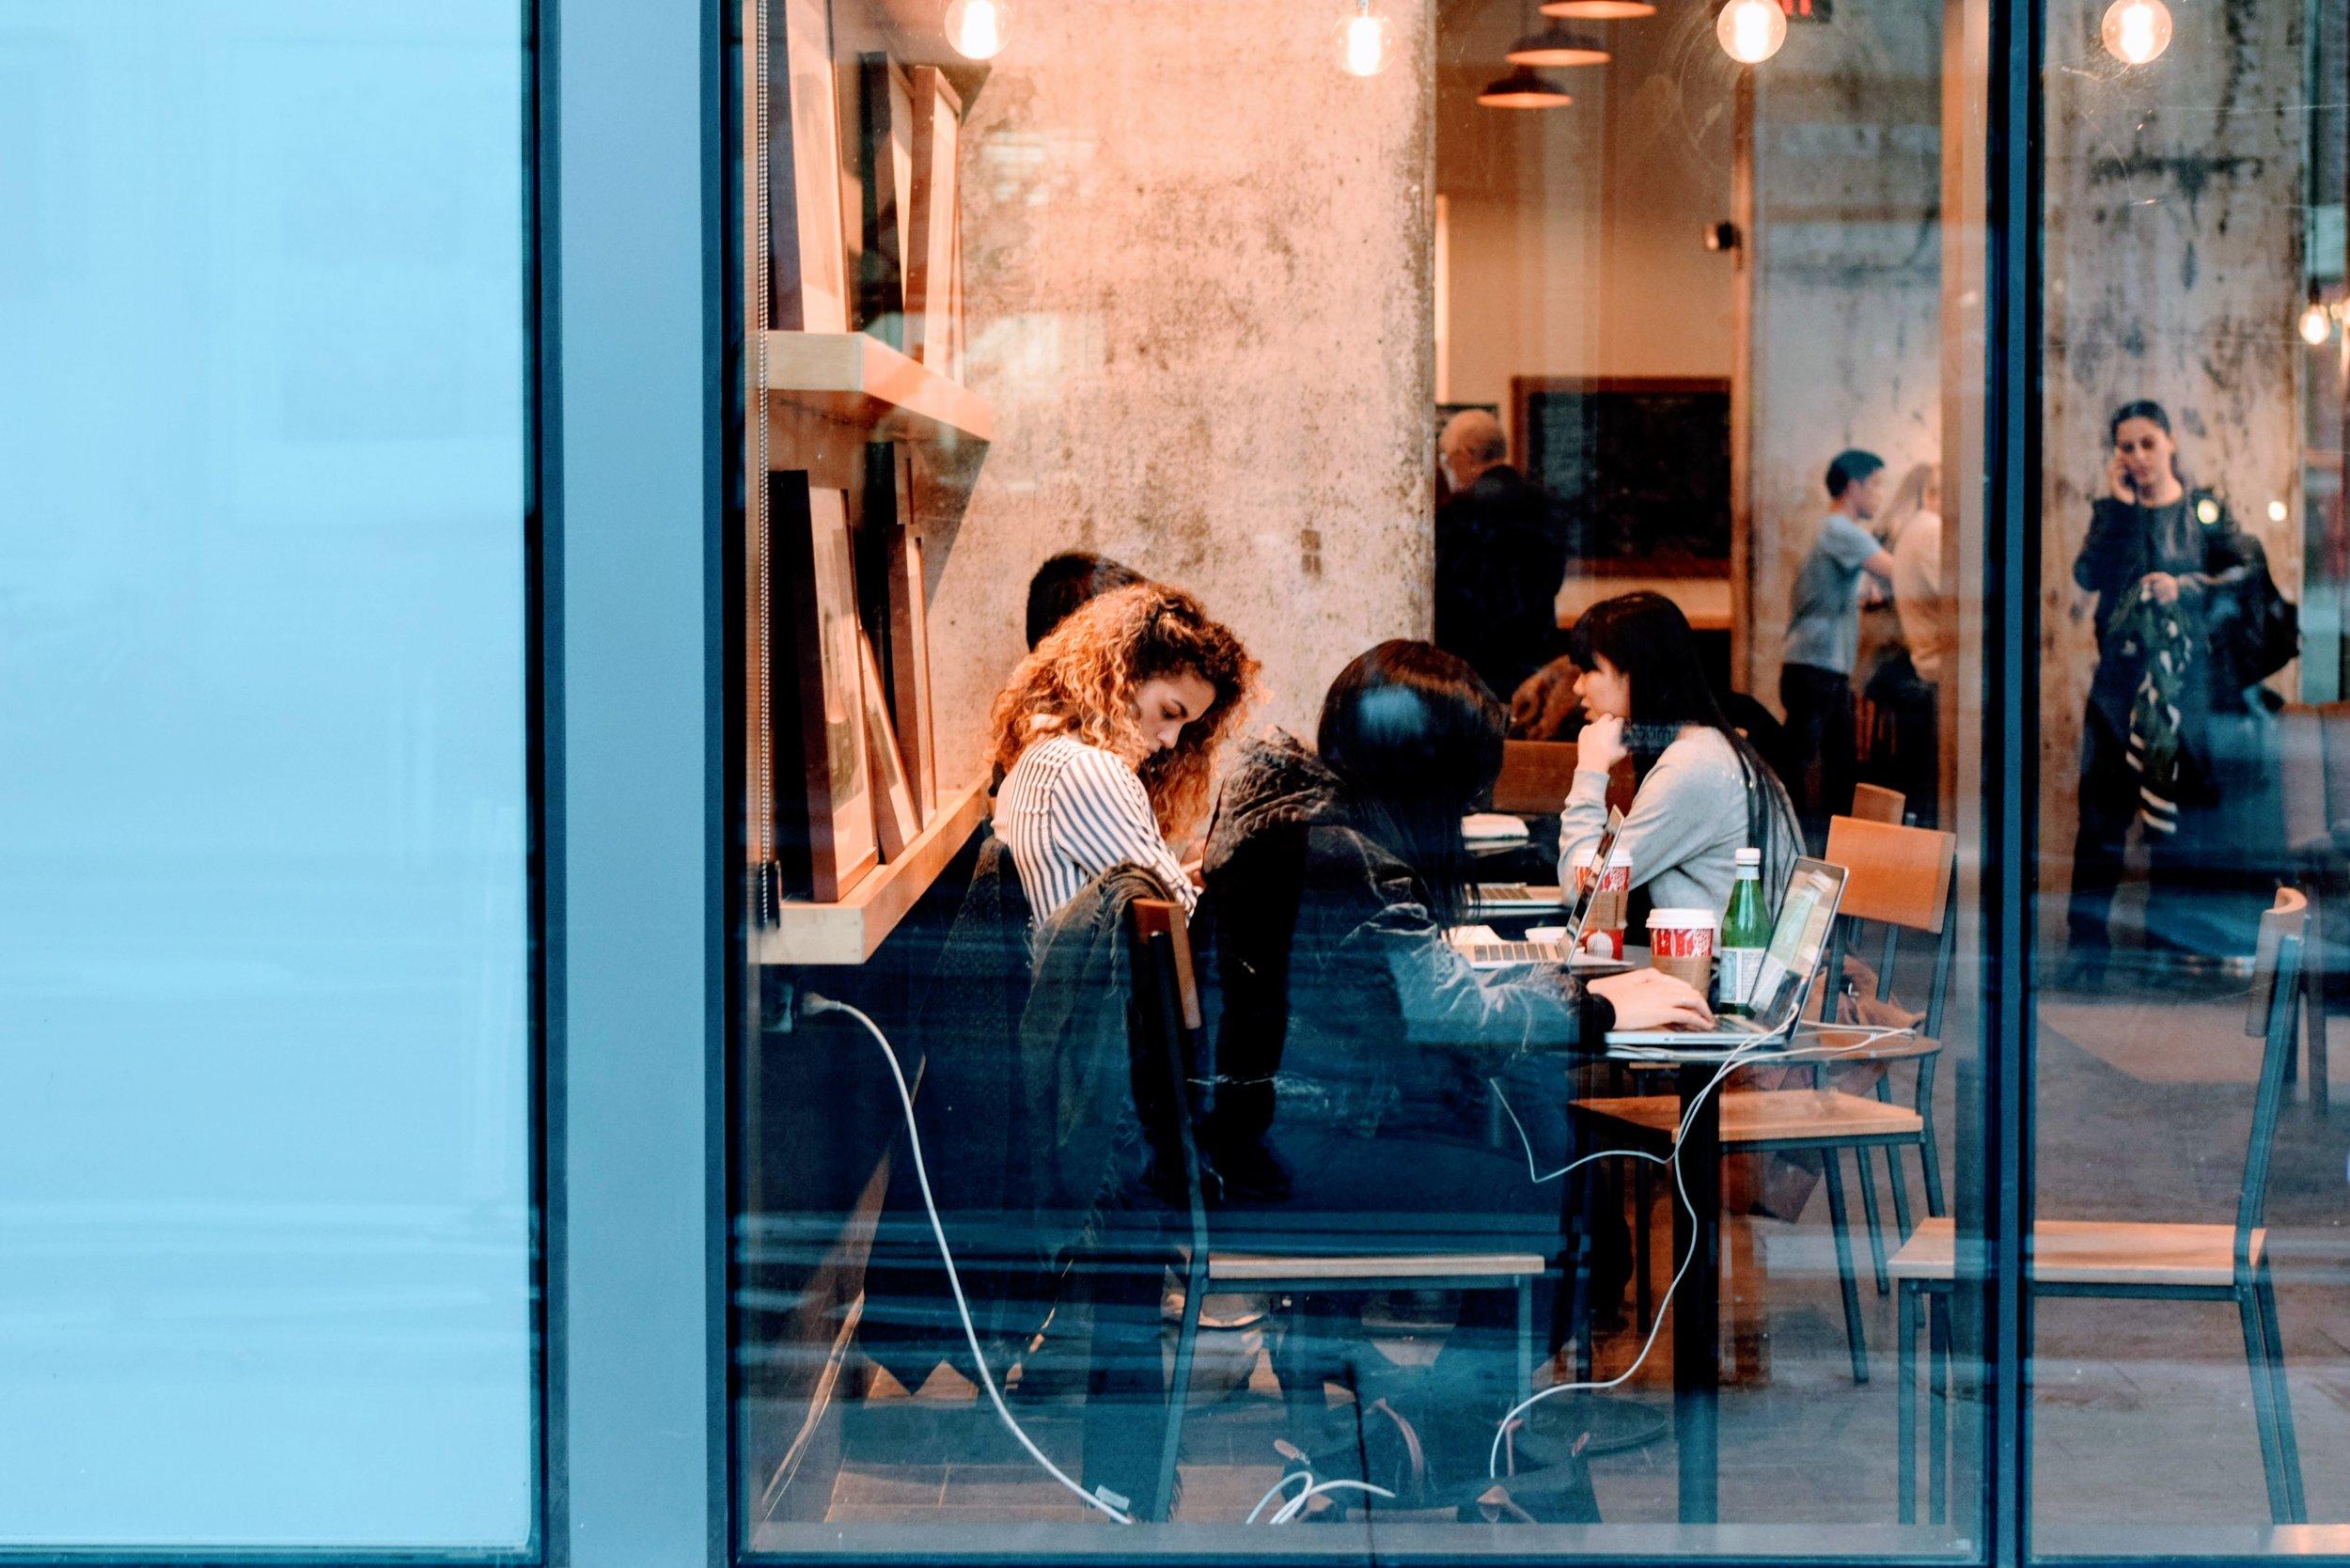 adult-bar-cafe-city-240223.jpg